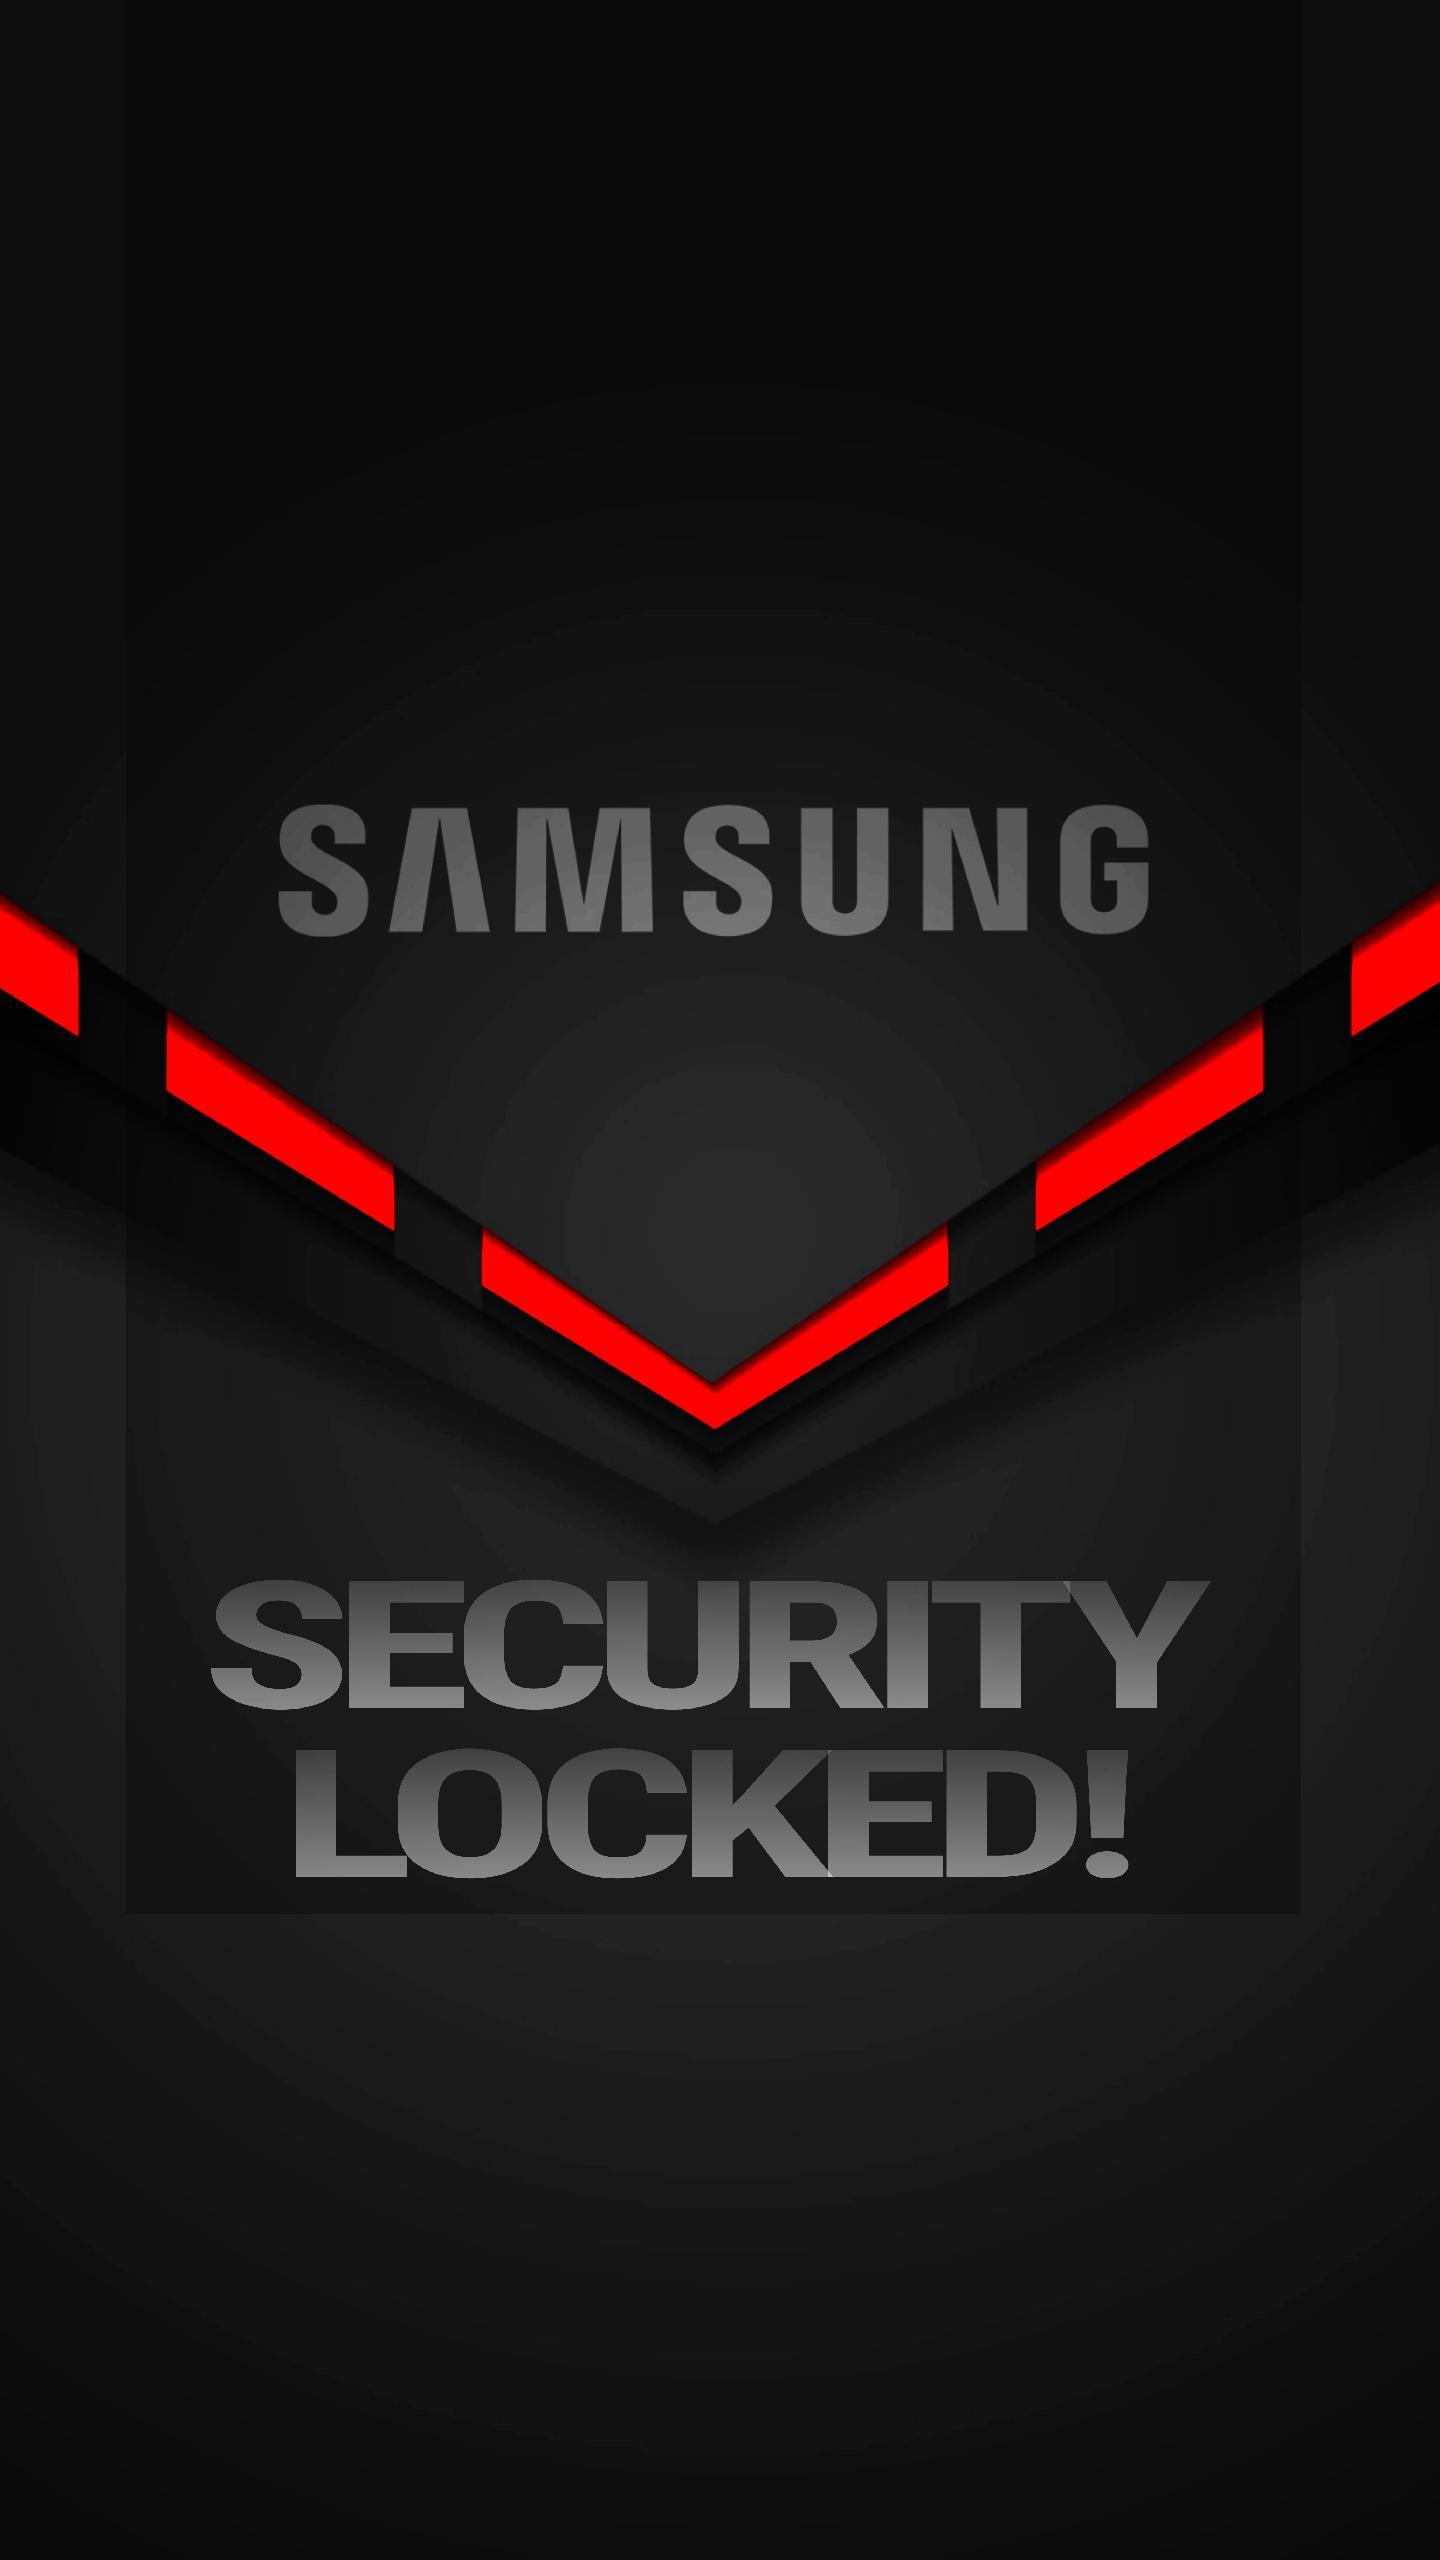 Lock Screen Background Hd Wallpaper 145 Lock Screen Samsung Background 1440x2560 Wallpaper Teahub Io